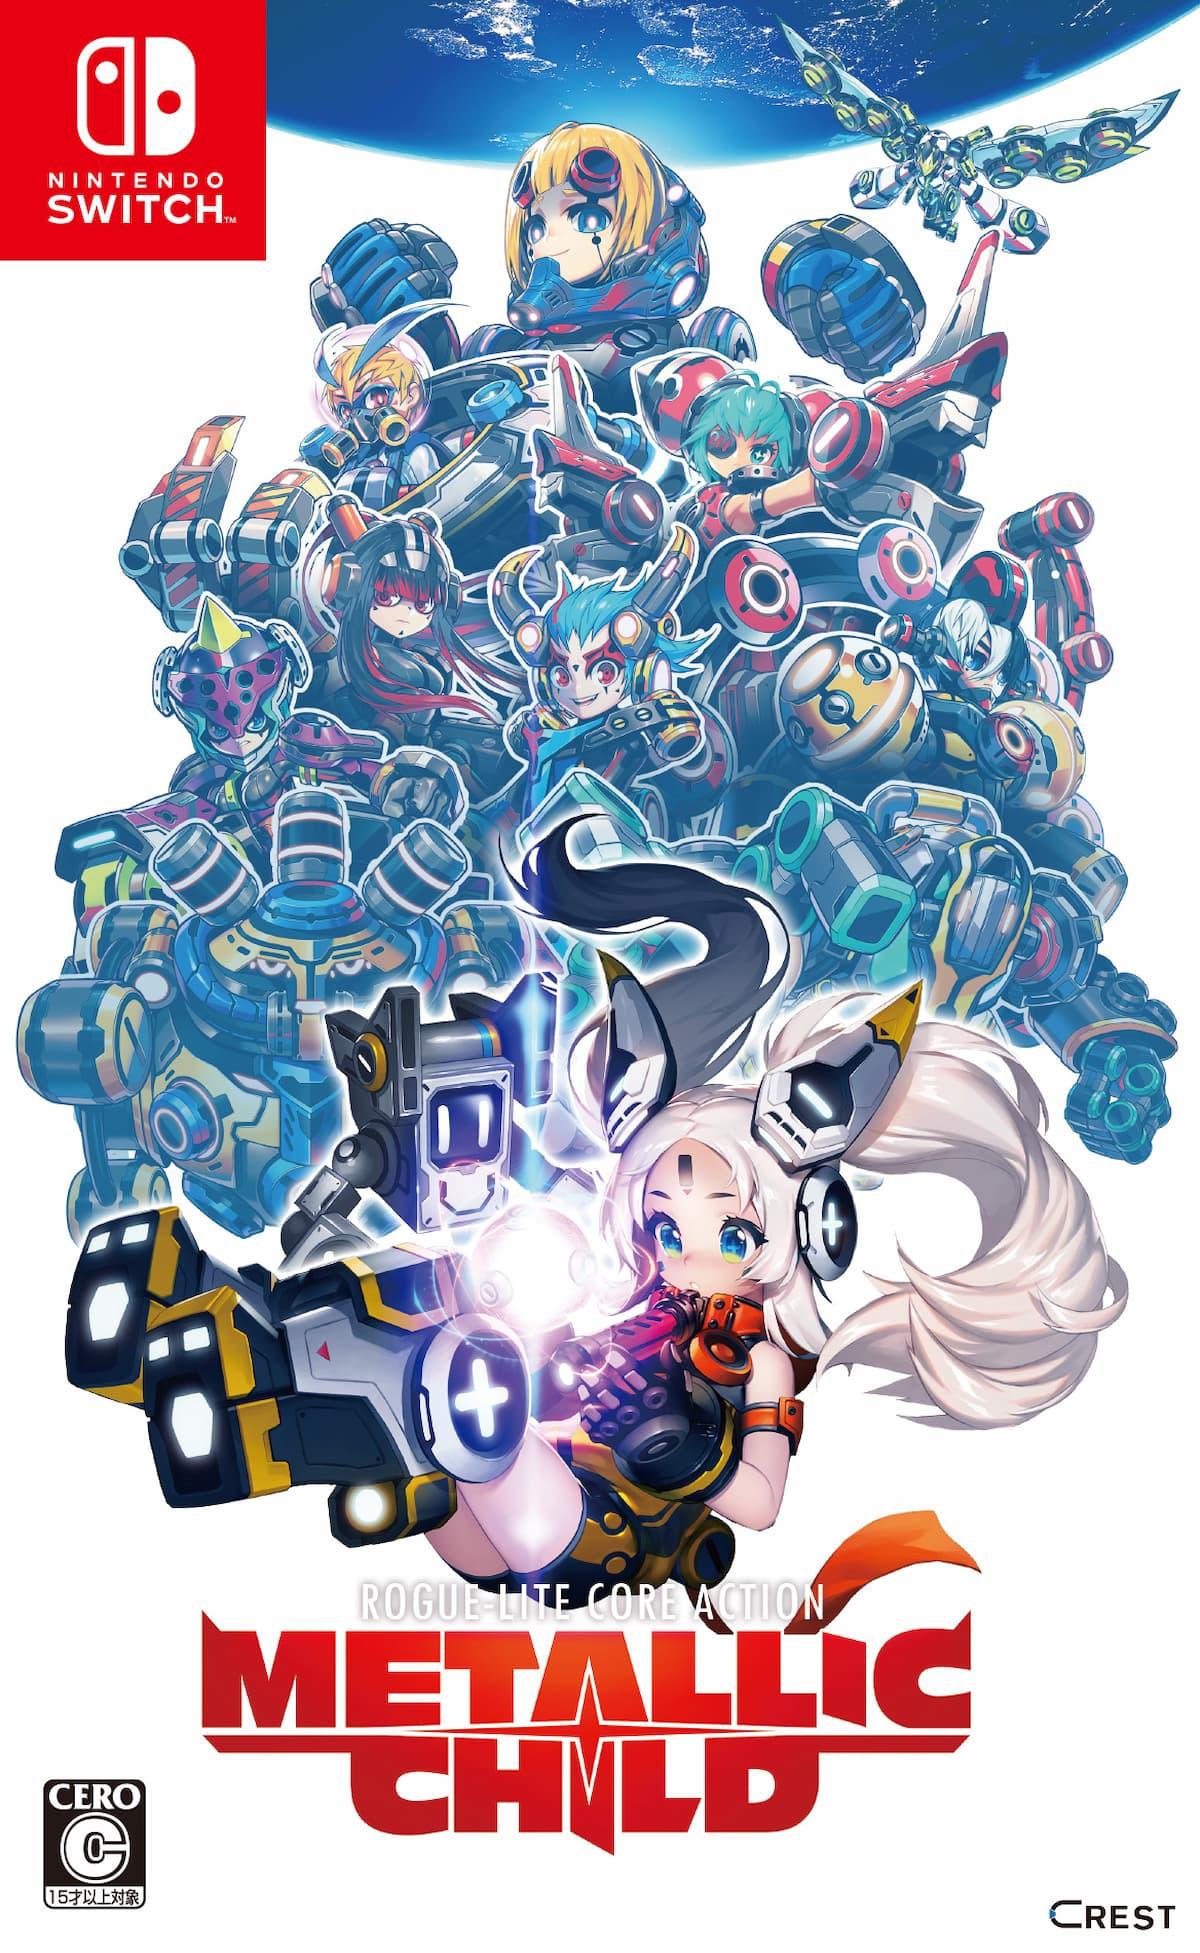 Nintendo Switch「METALLIC CHILD」パッケージ版 イメージ